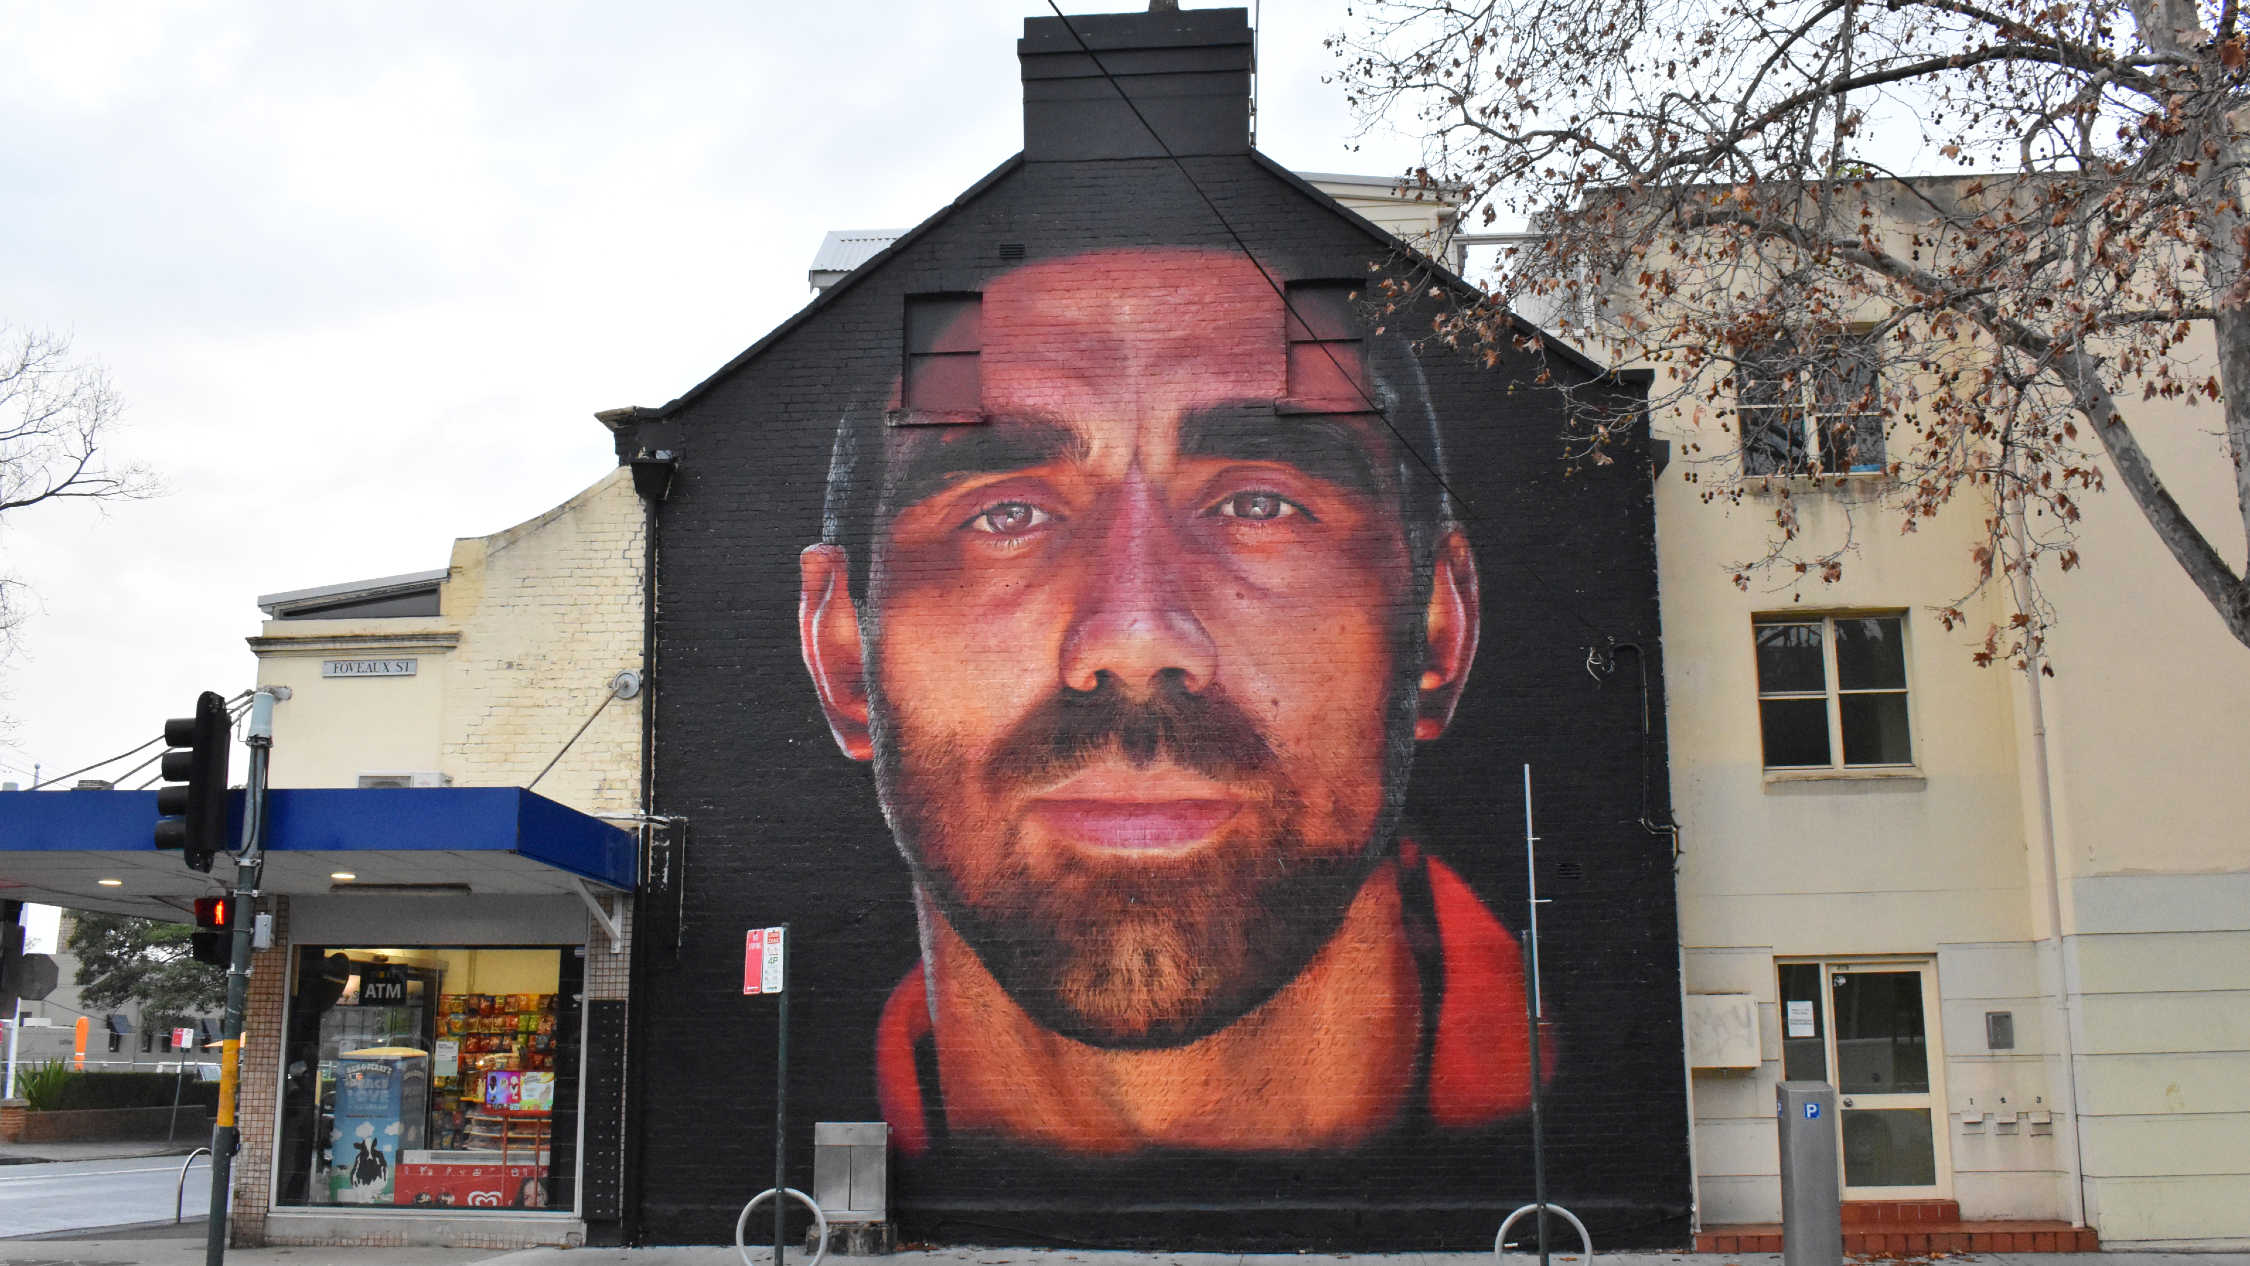 Adam Goodes mural in Surry Hills